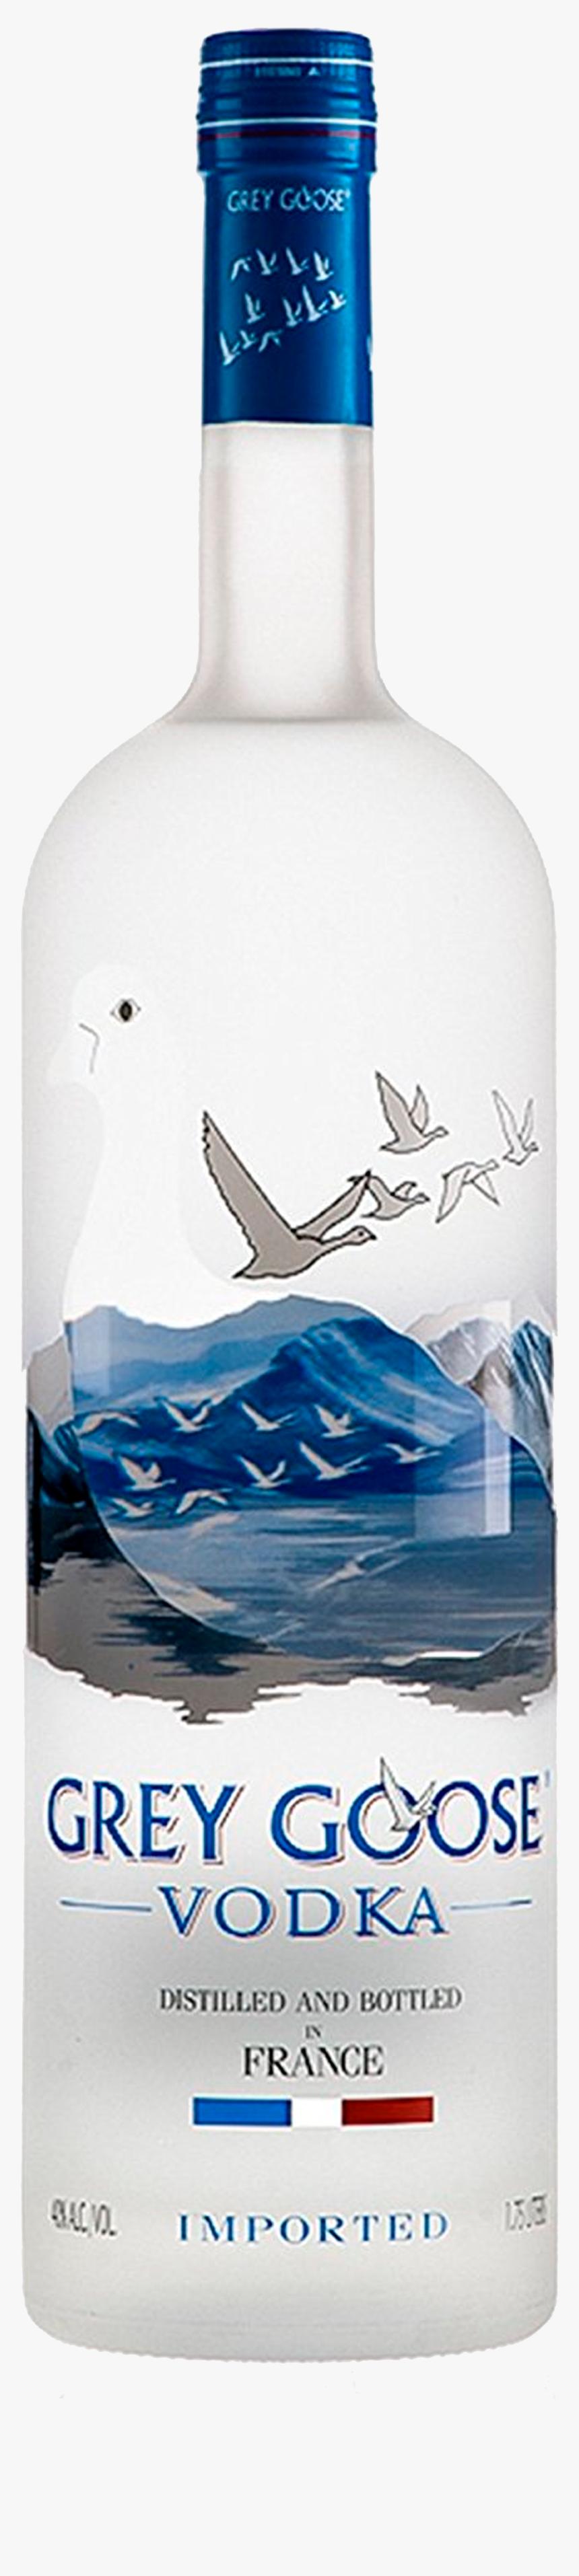 Grey Goose Png, Transparent Png, Free Download